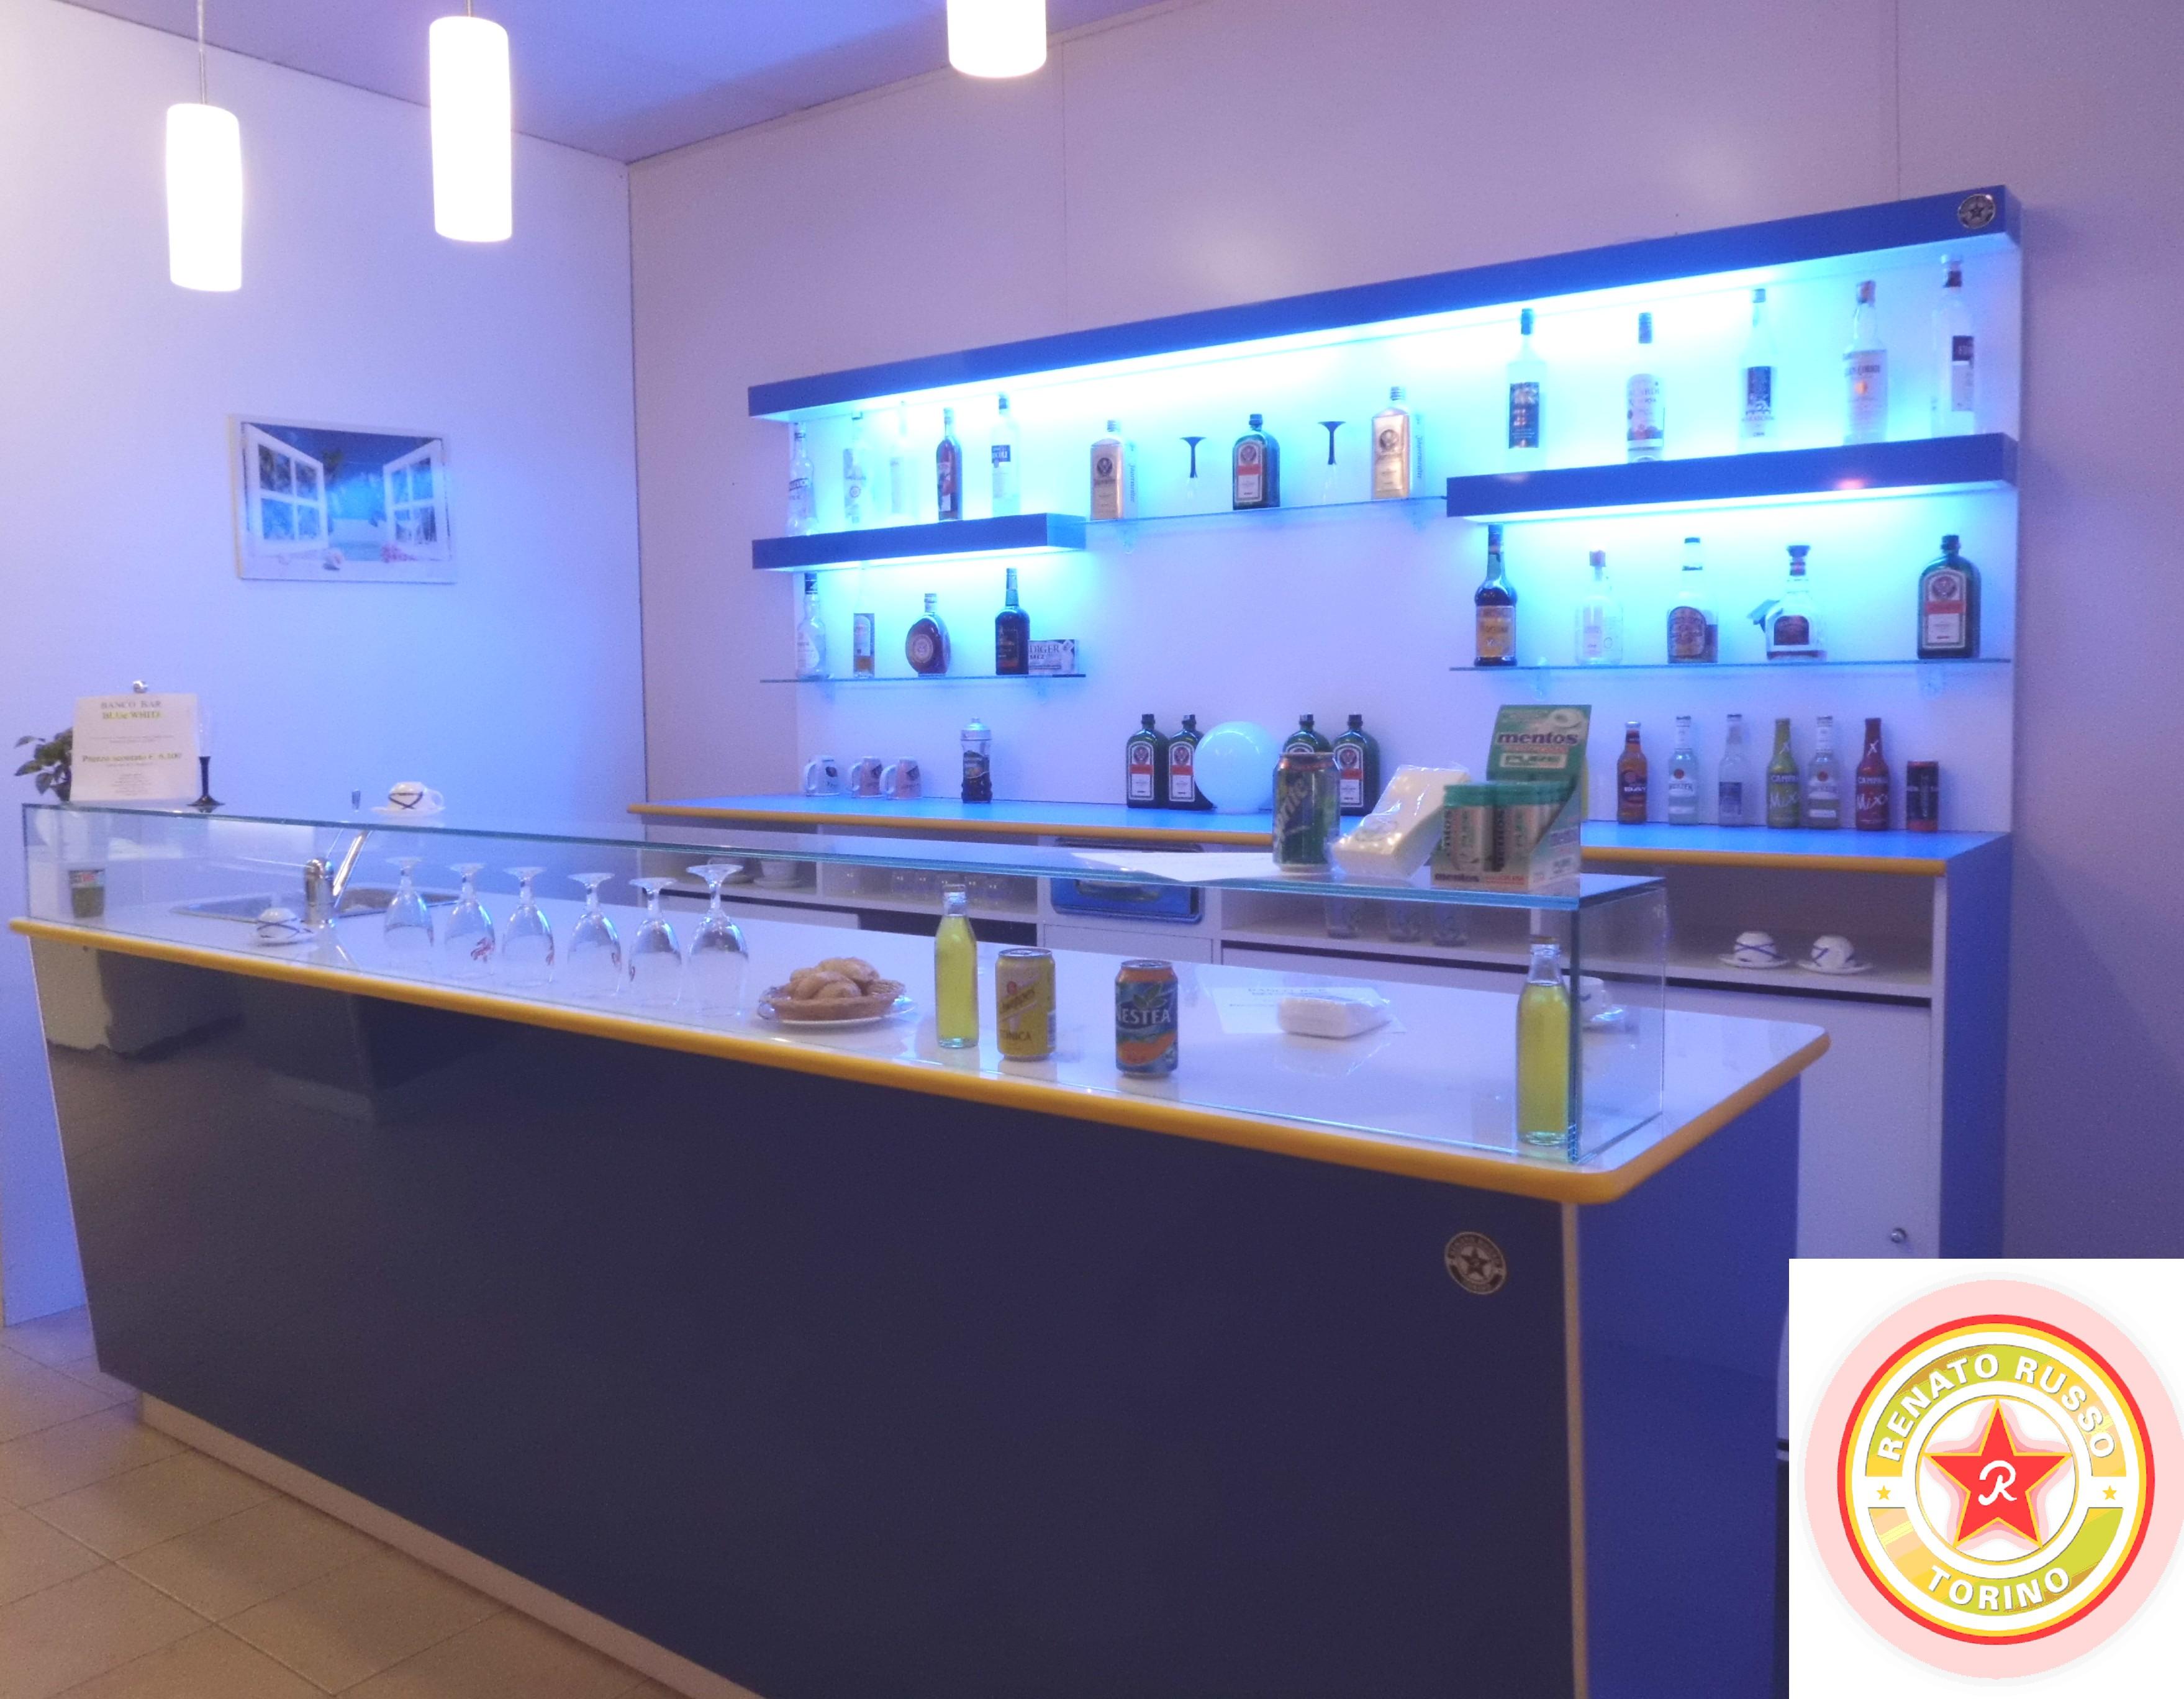 Arredo Bar Nuovo.Banco Bar Milano Compra In Fabbrica Banchi Bar Realizzati